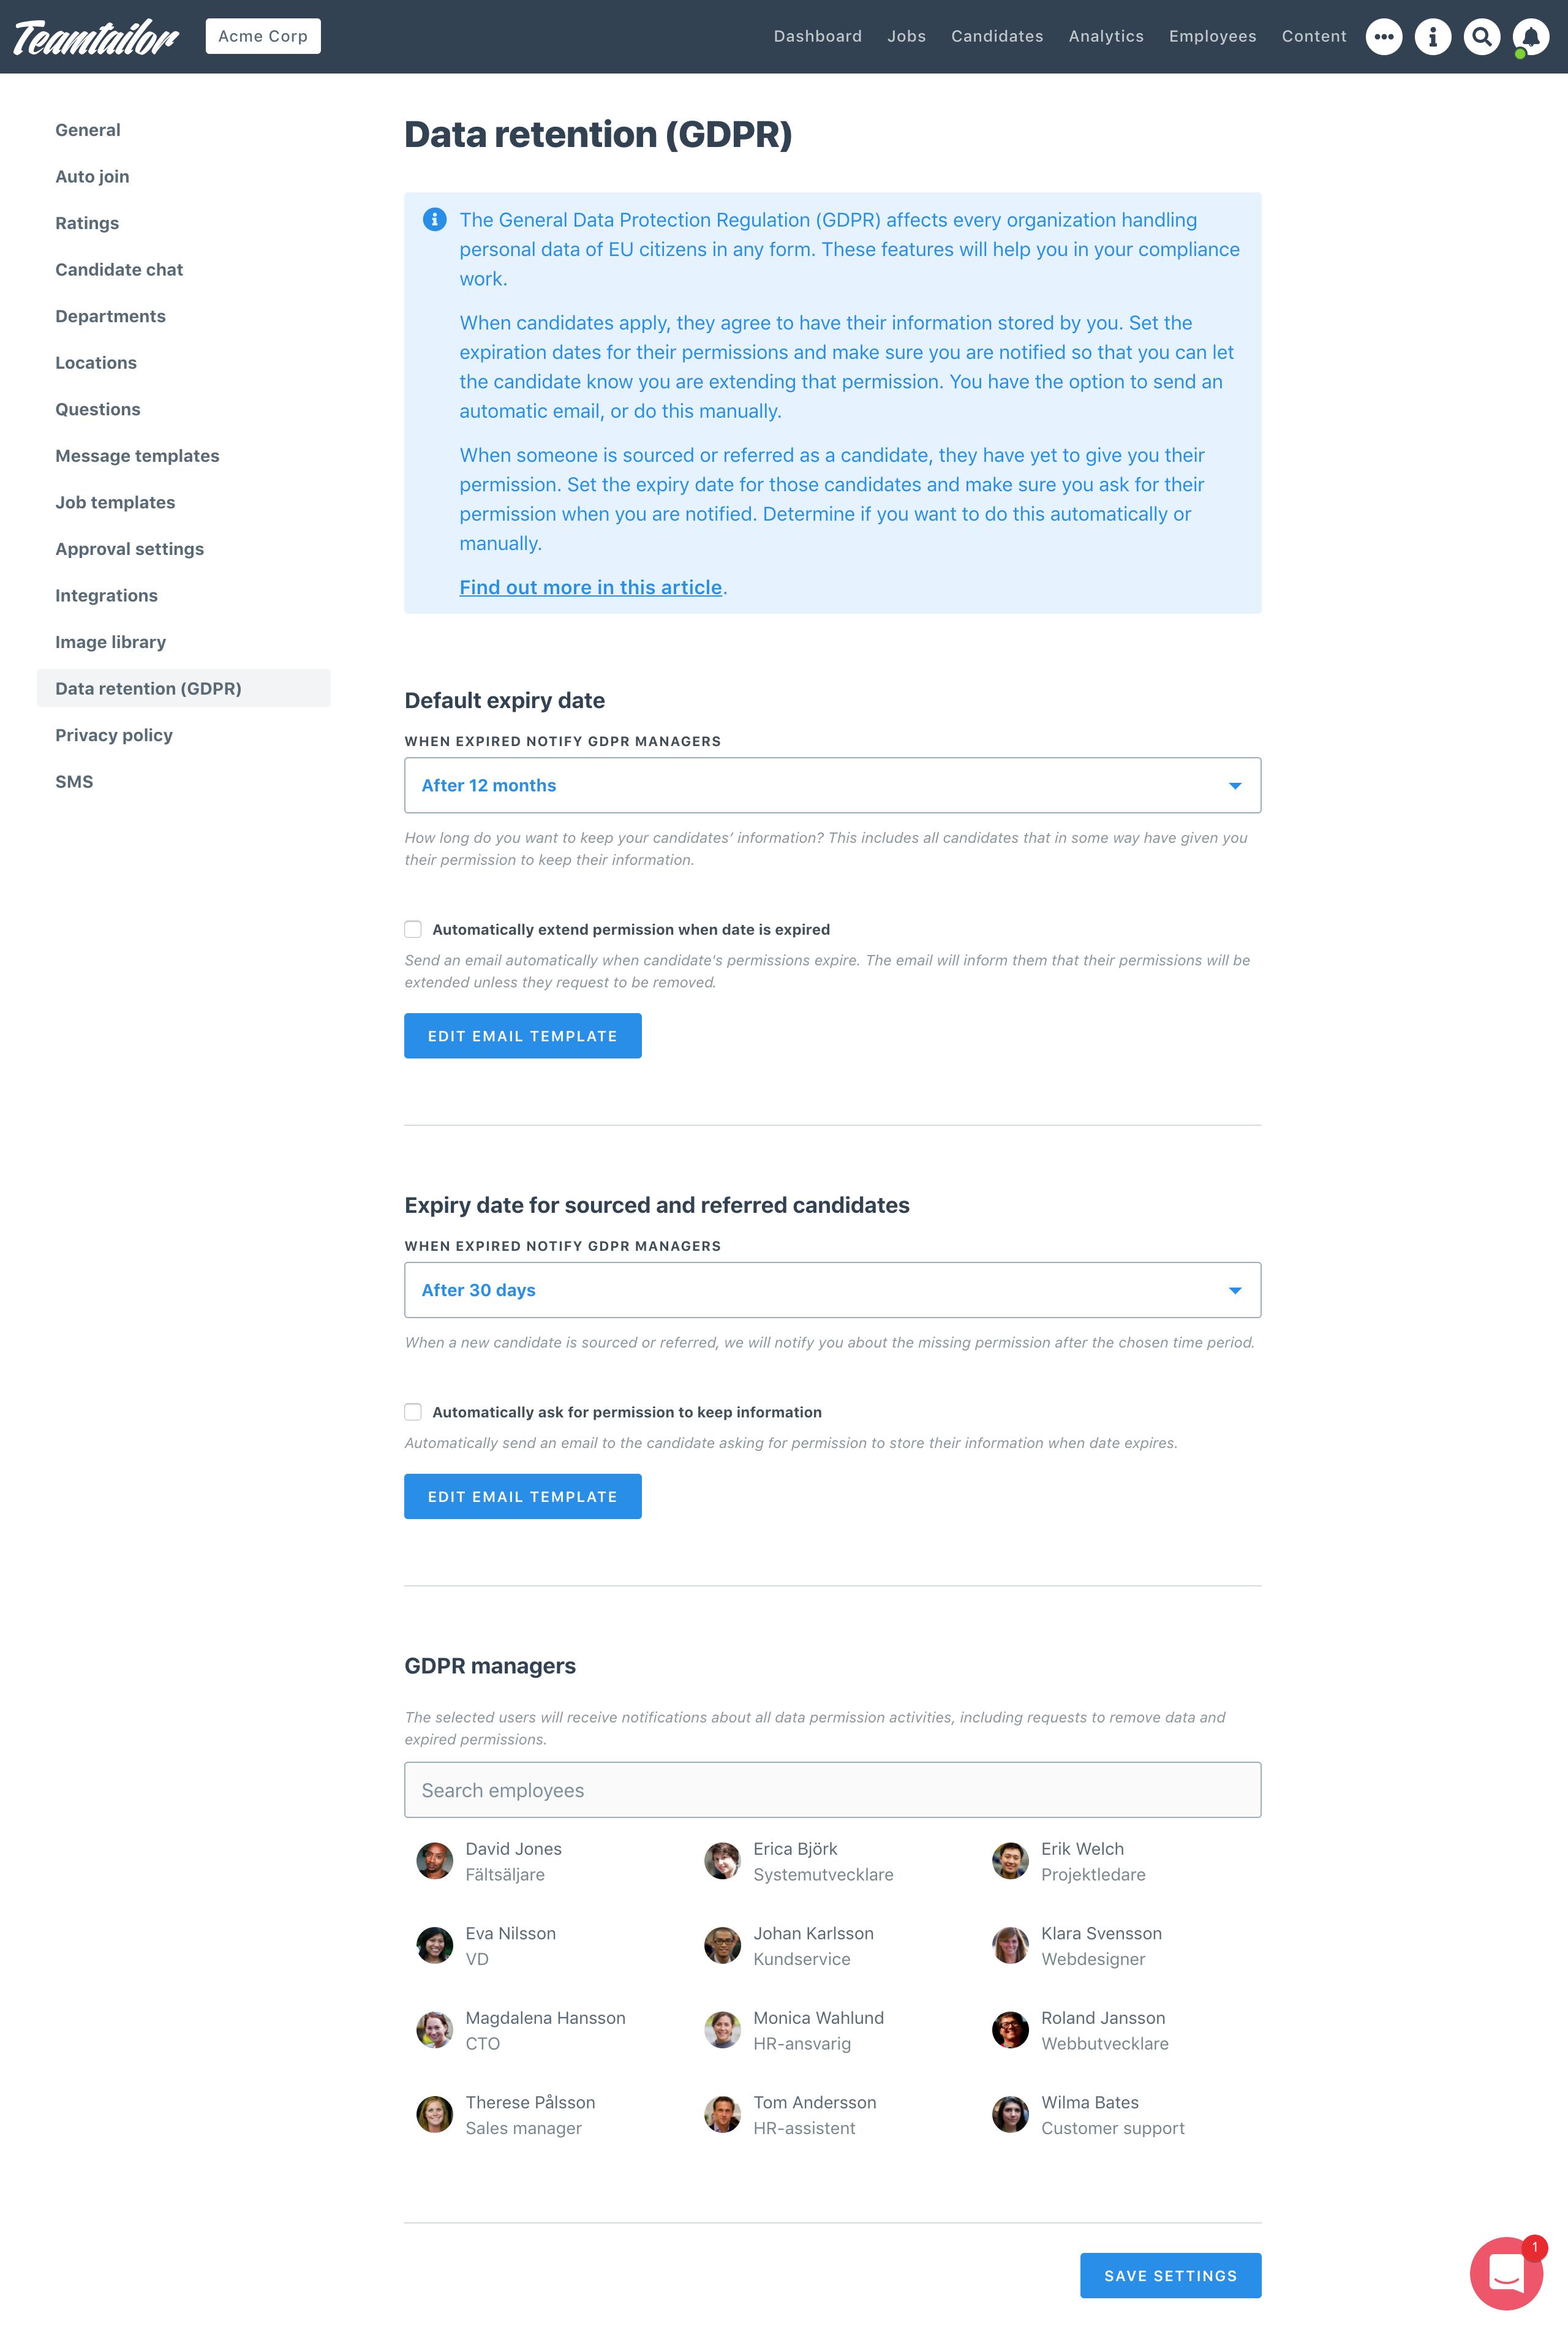 screencapture-teamtailor-app-companies-tGaue7TRbIM-settings-gdpr-2018-05-15-10_22_31